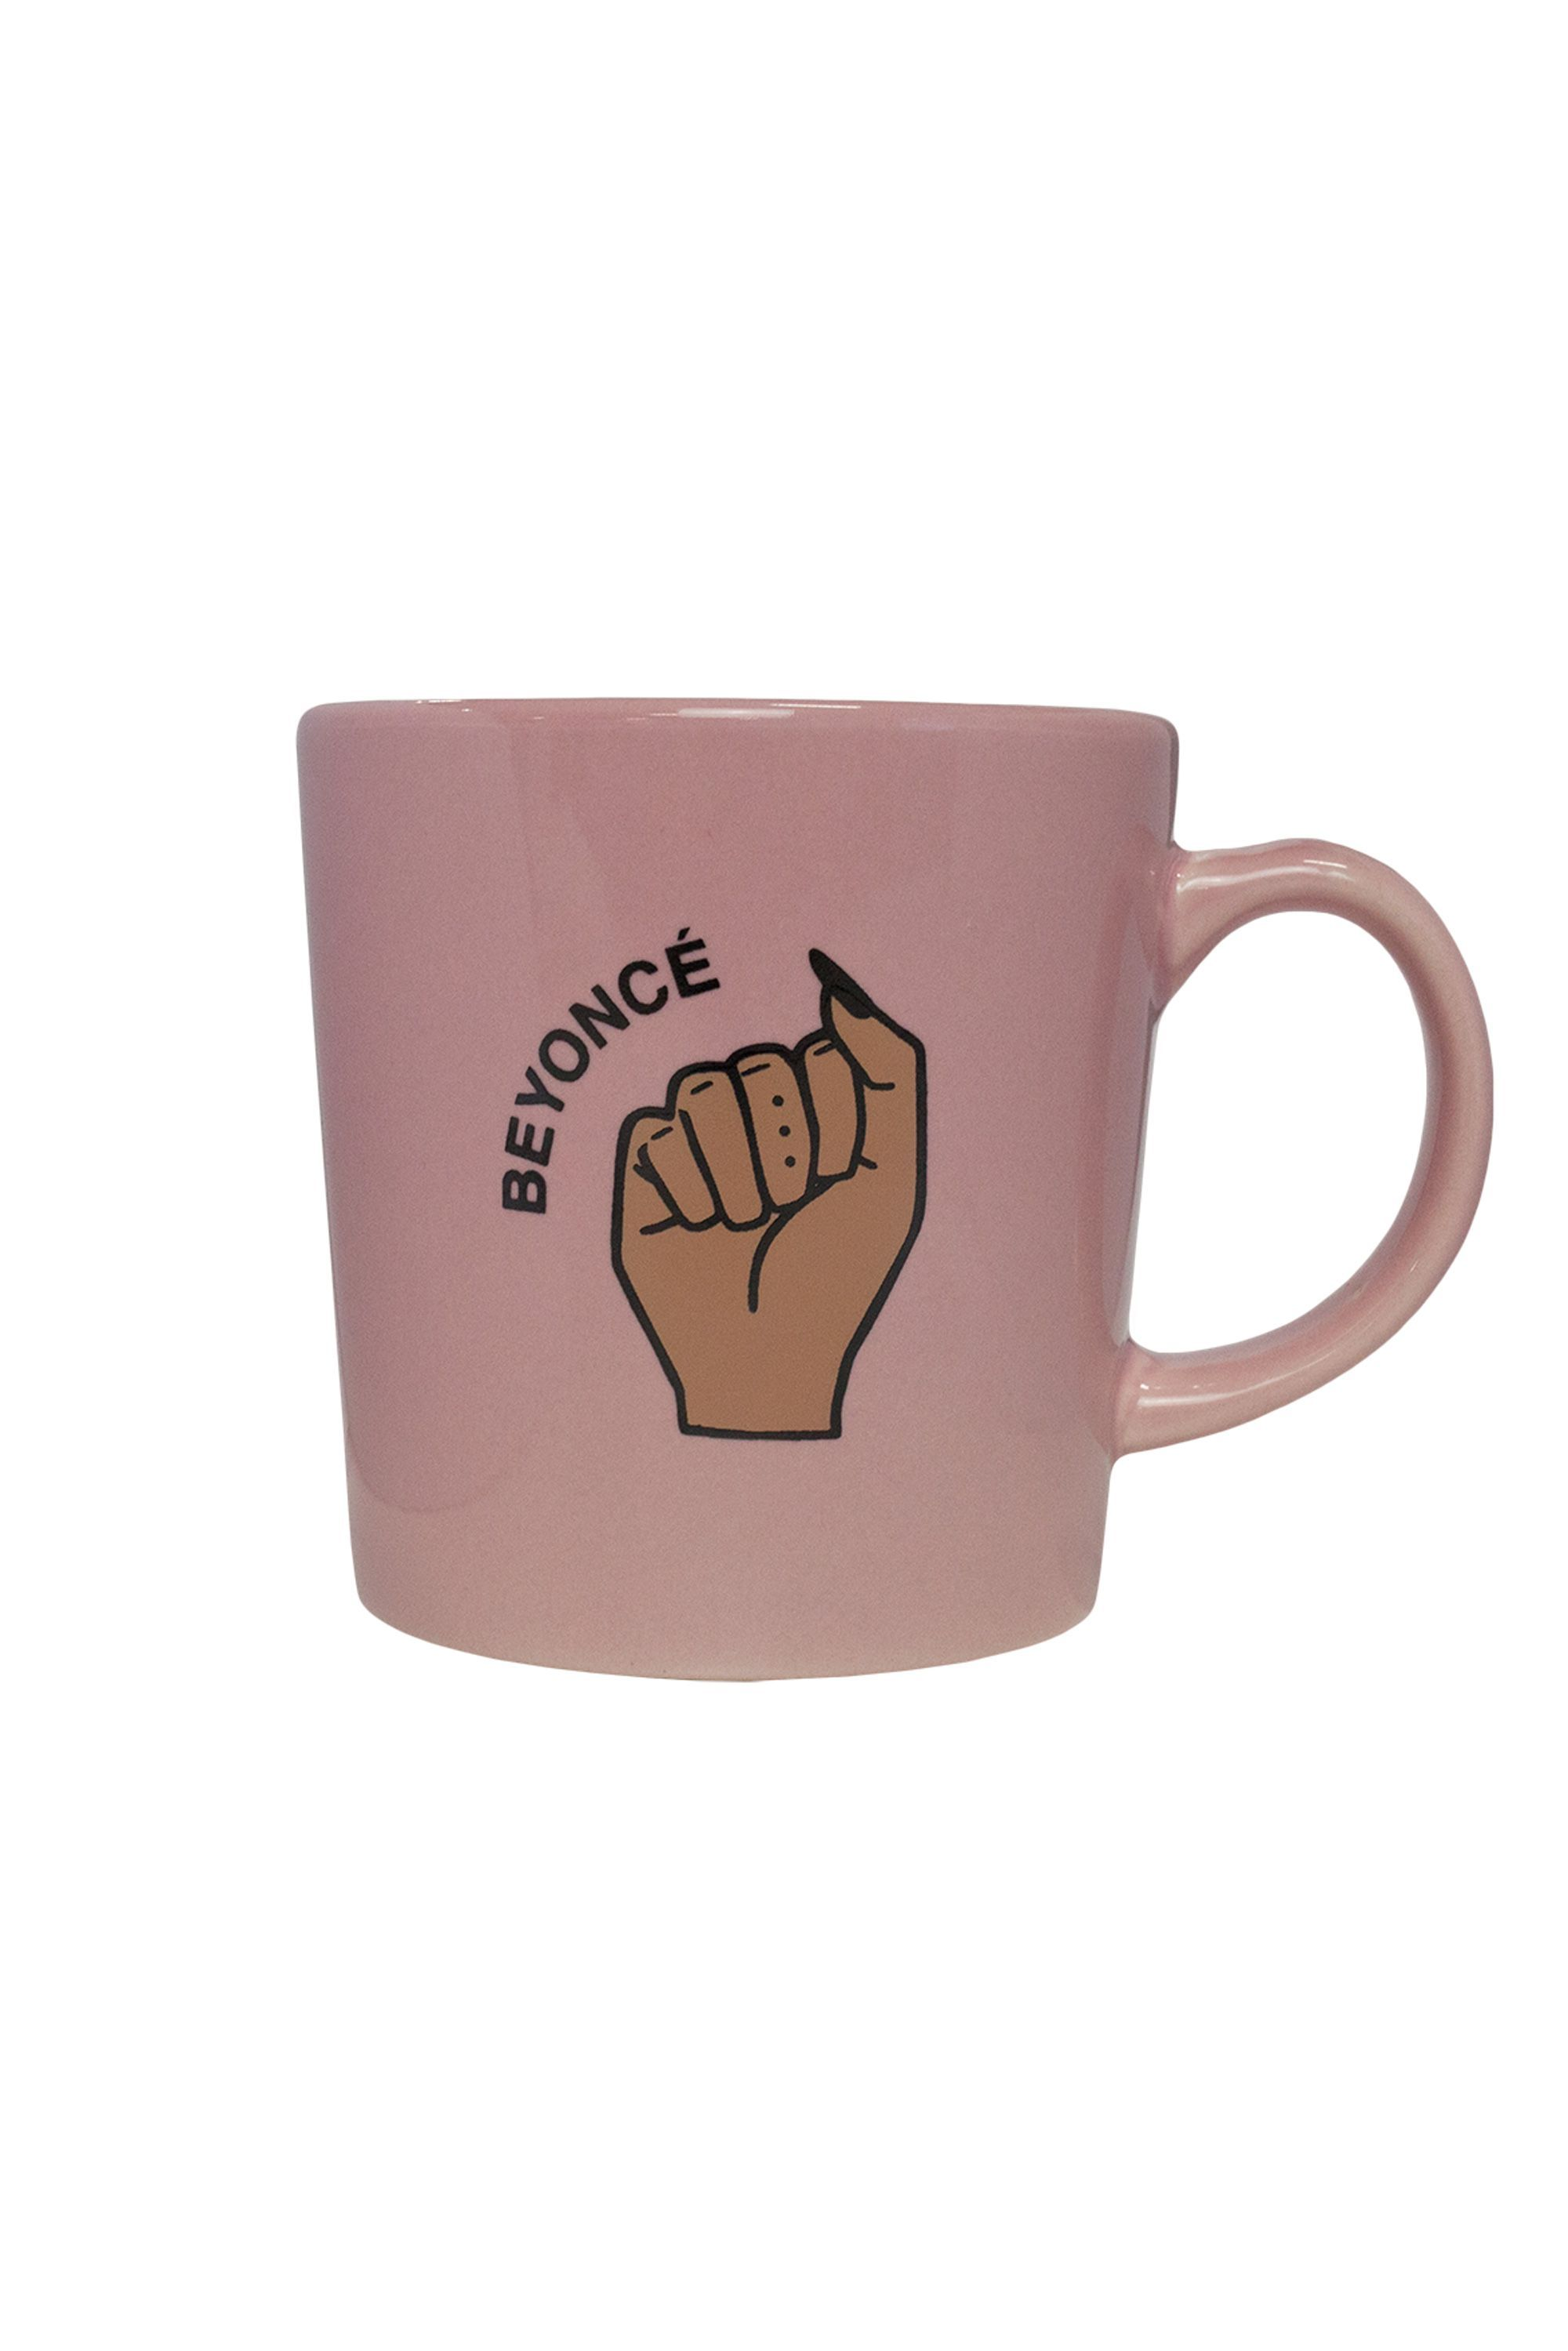 Fist Mug Beyoncé shop.beyonce.com $20.00 SHOP NOW She's Beyoncé's #1 fan.